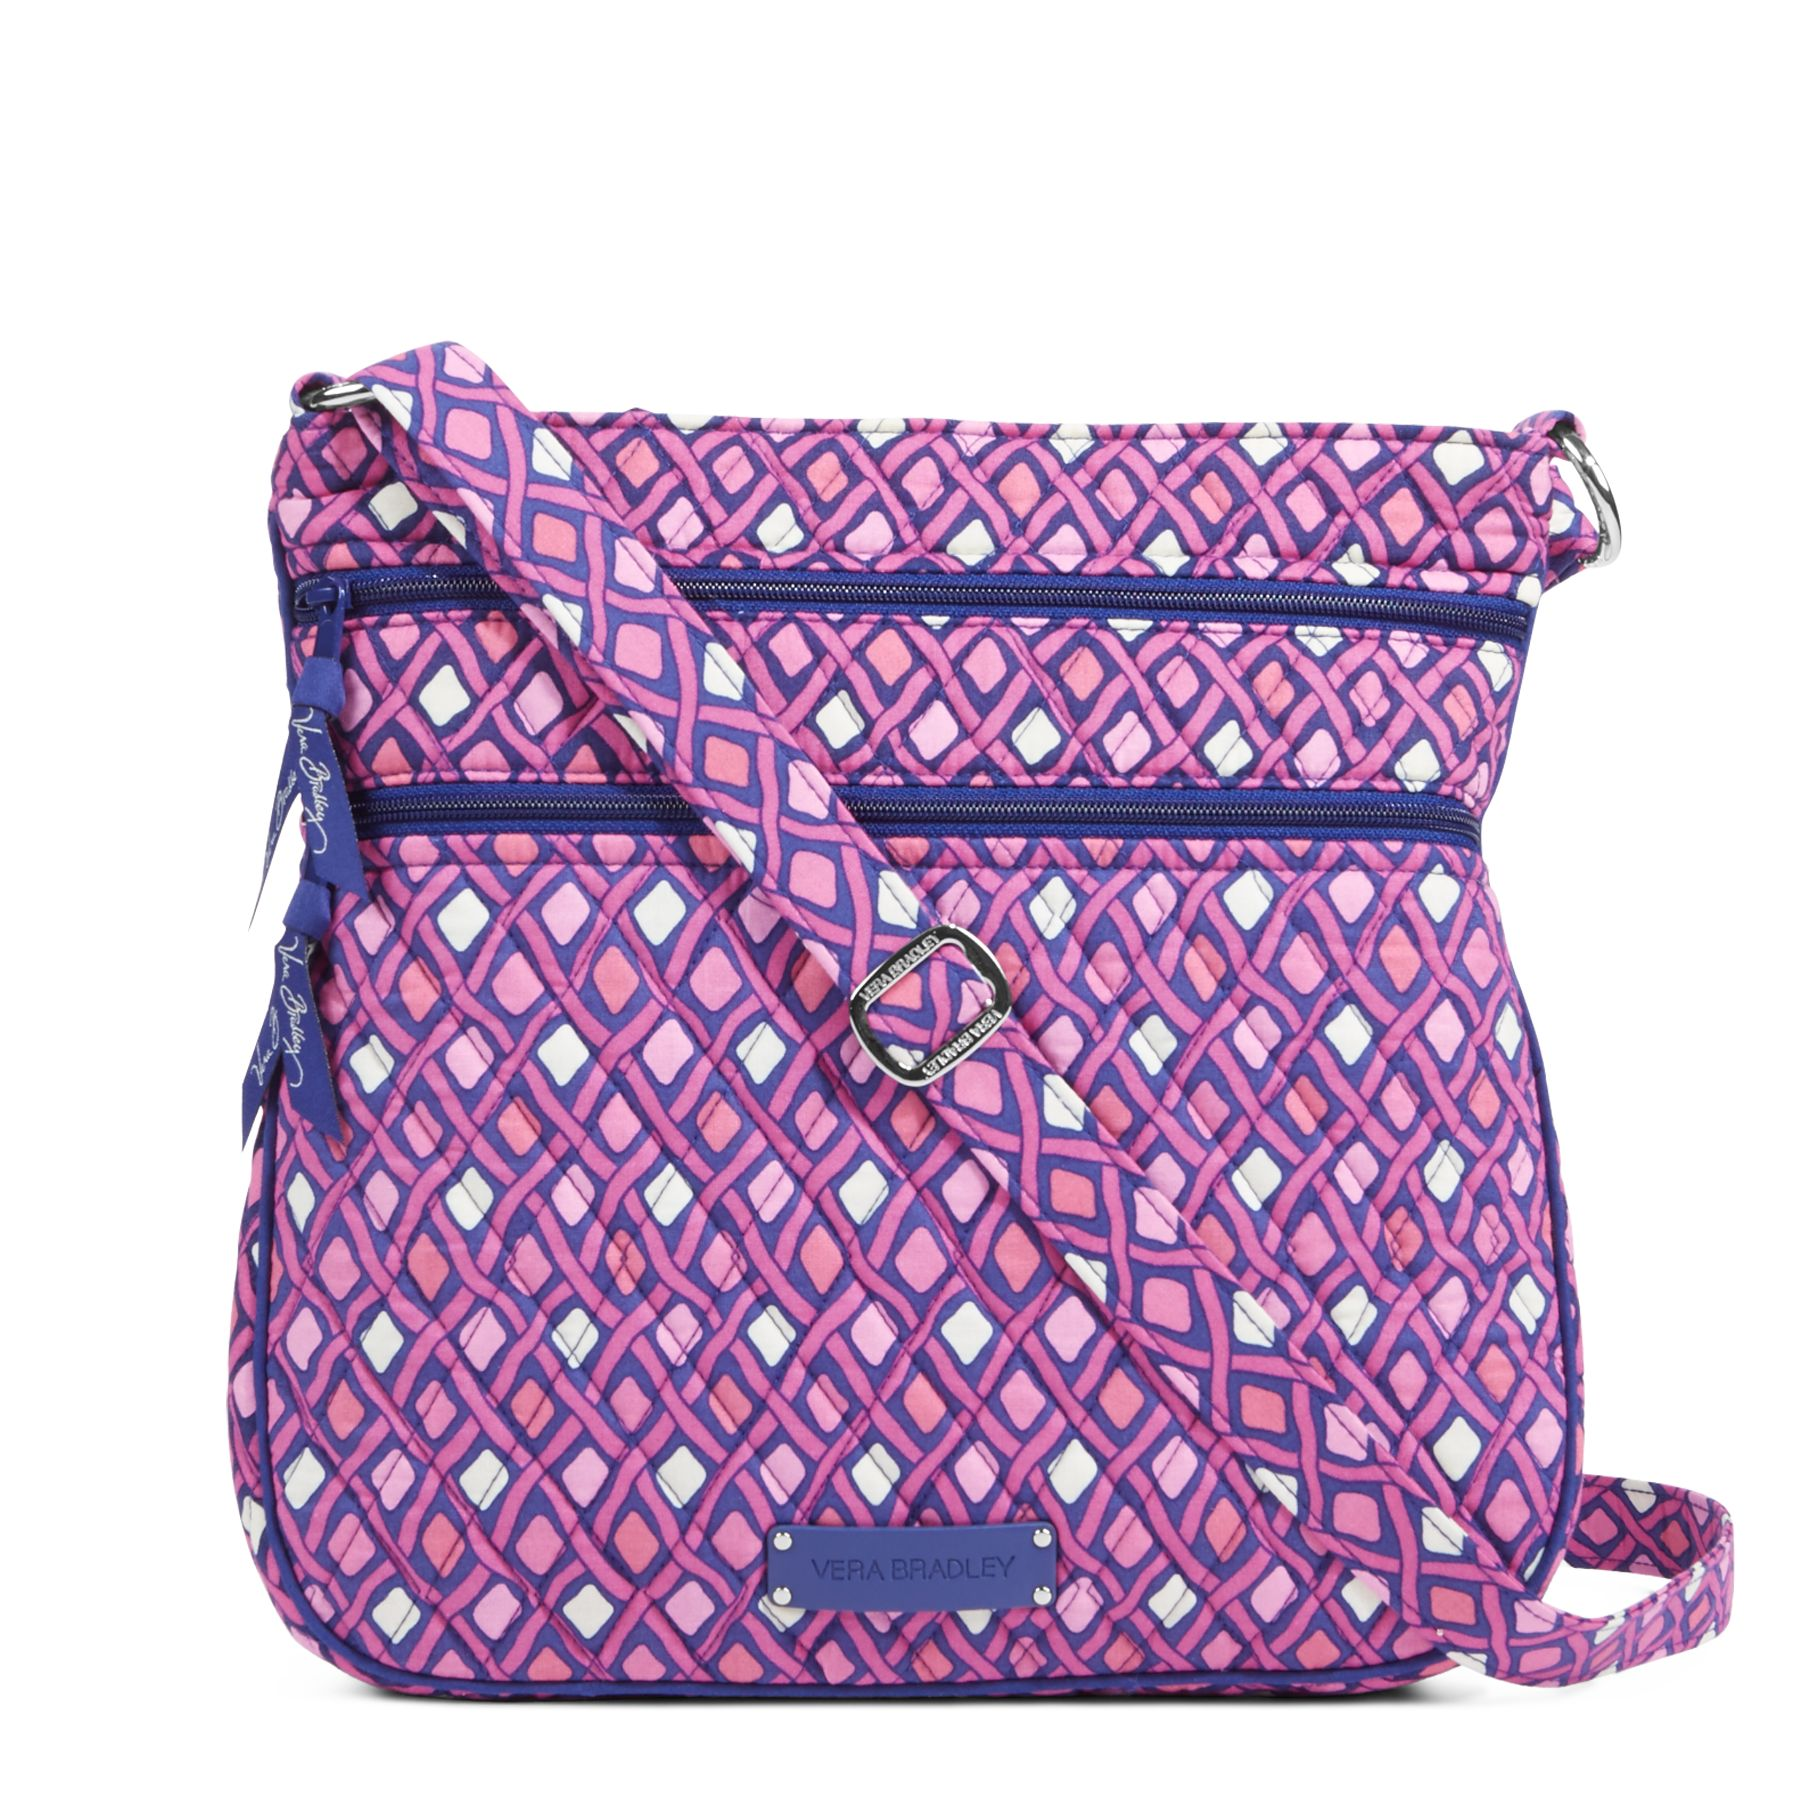 Vera bradley triple zip hipster crossbody bag 5e6a3854675f4